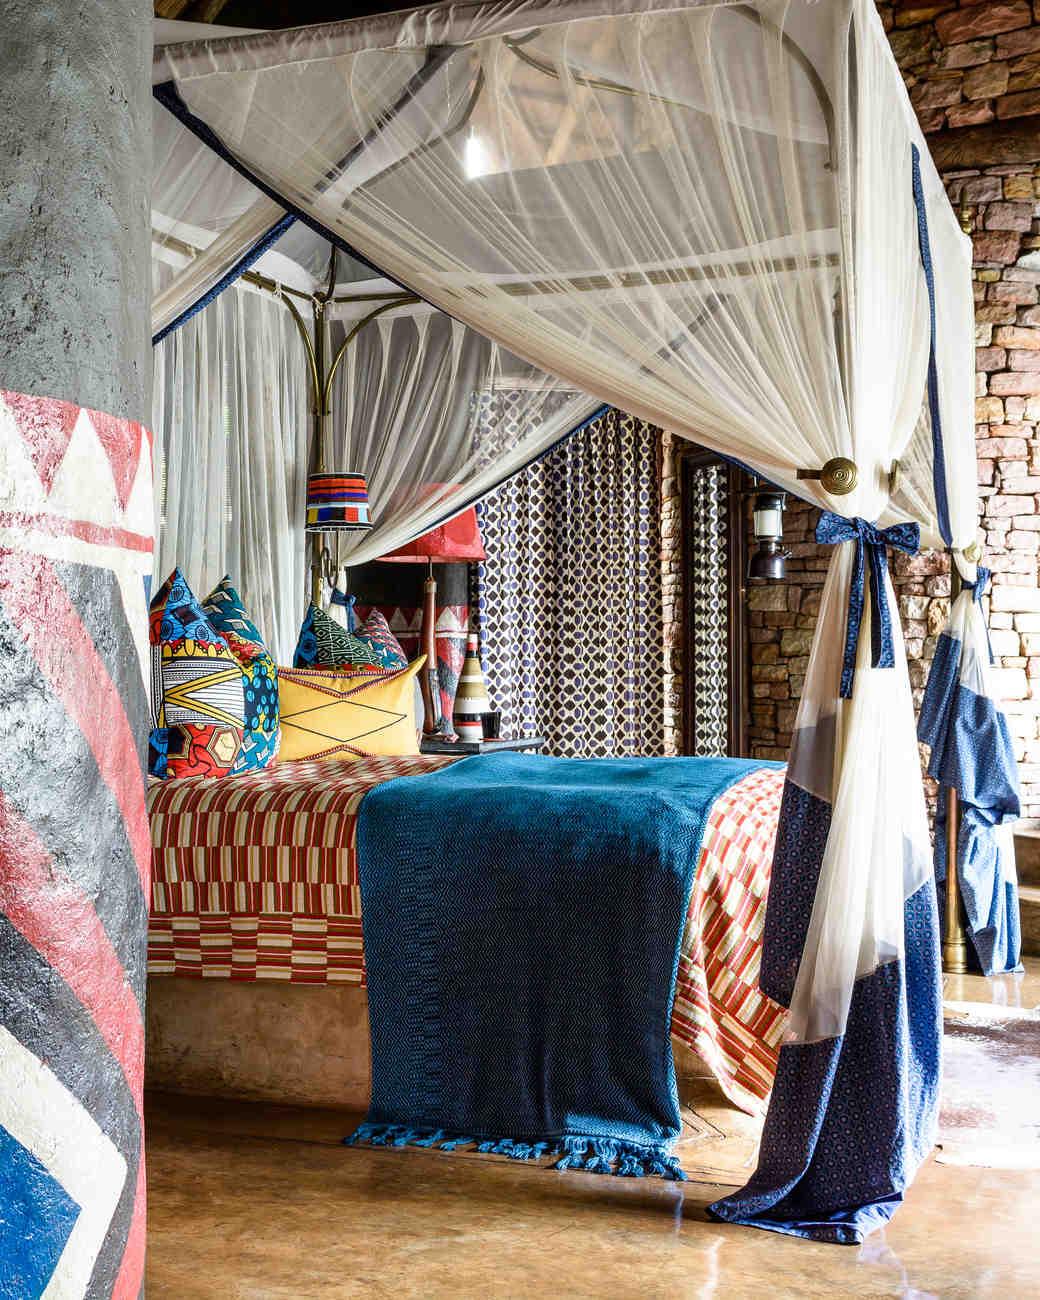 singita-pamushana-lodge-africa-wedding-venue-room-0815.jpg